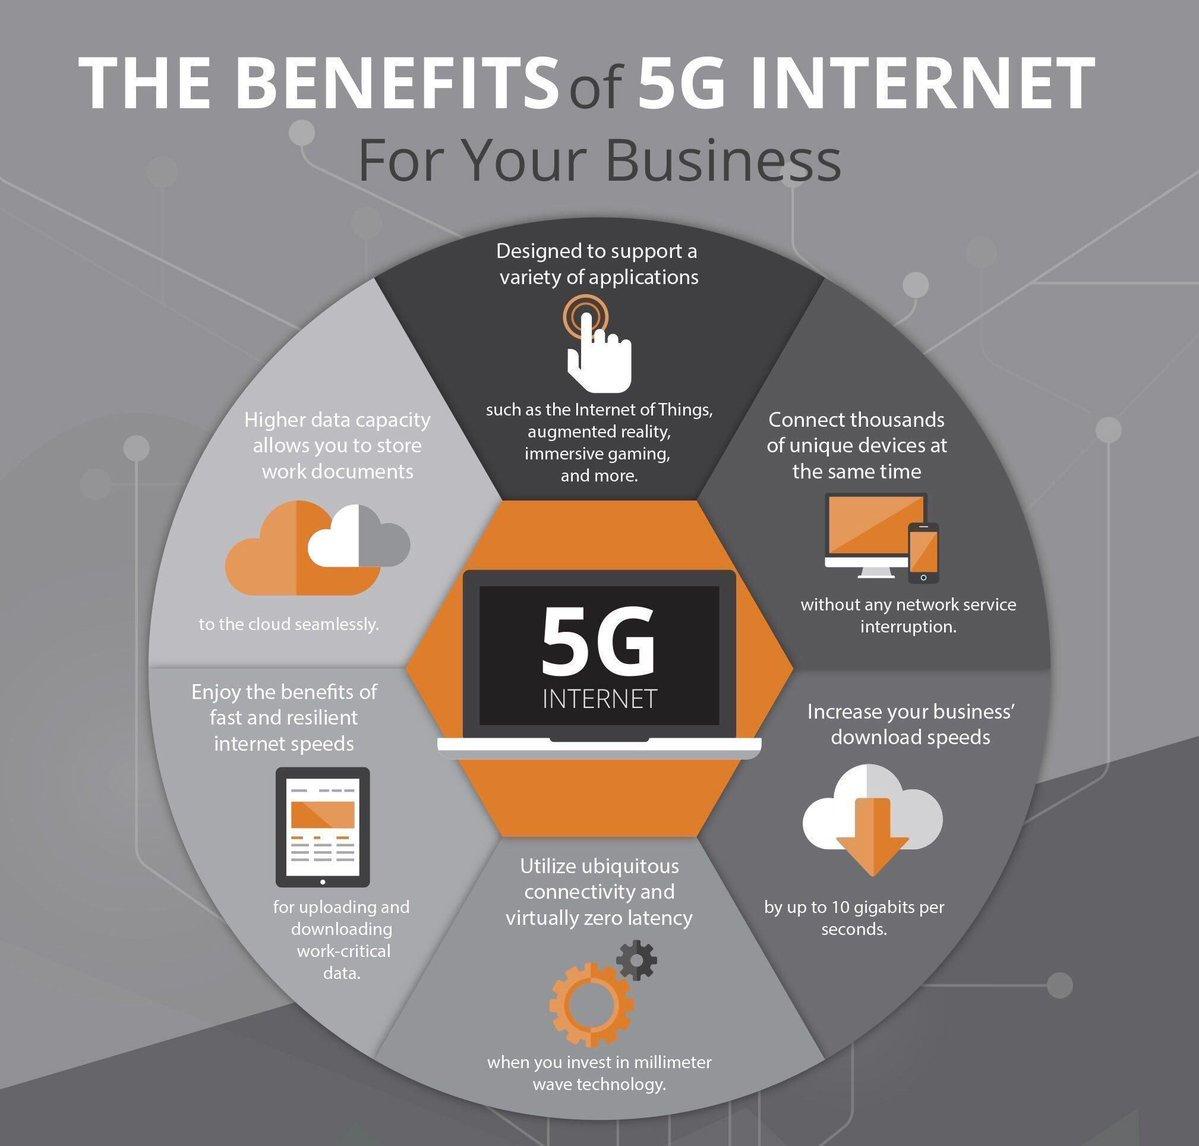 What are the #business benefits of #5G?  #CyberSecurity #infosec #mobile #Wearables #SmartCity #BigData #IoT #IIoT #smartgrids #fintech #autonomousCar   Cc  @jblefevre60 @Paula_Piccard @Ronald_vanLoon @mvollmer1 @TamaraMcCleary @kashthefuturist @TheFuturist007  MT @Fisher85M